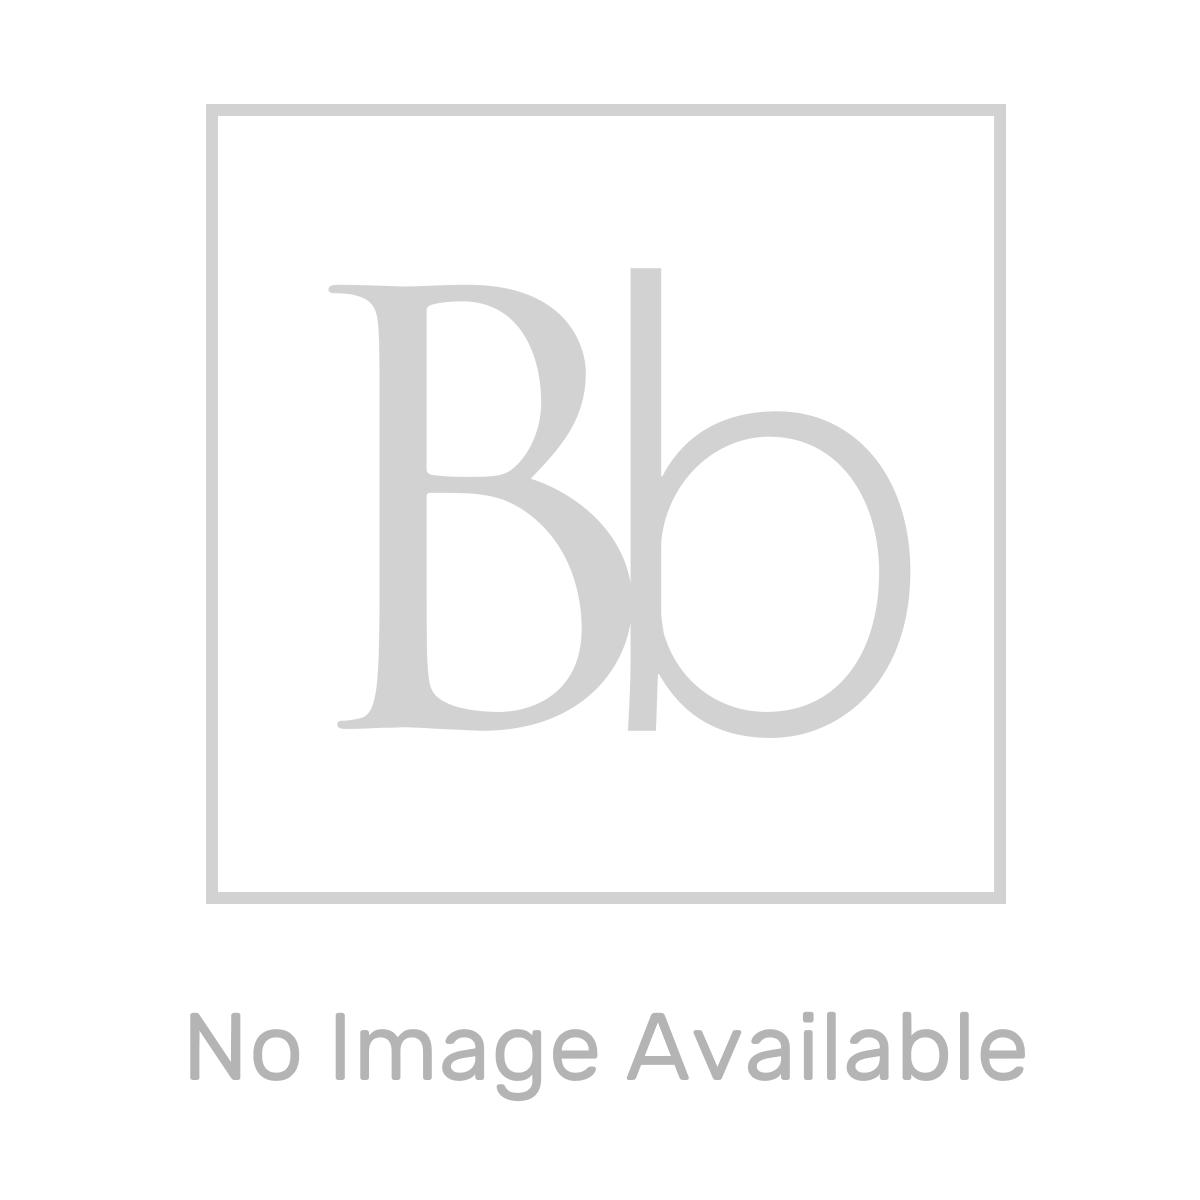 Aquadart White Slate Shower Tray 1400 x 800 Overhead